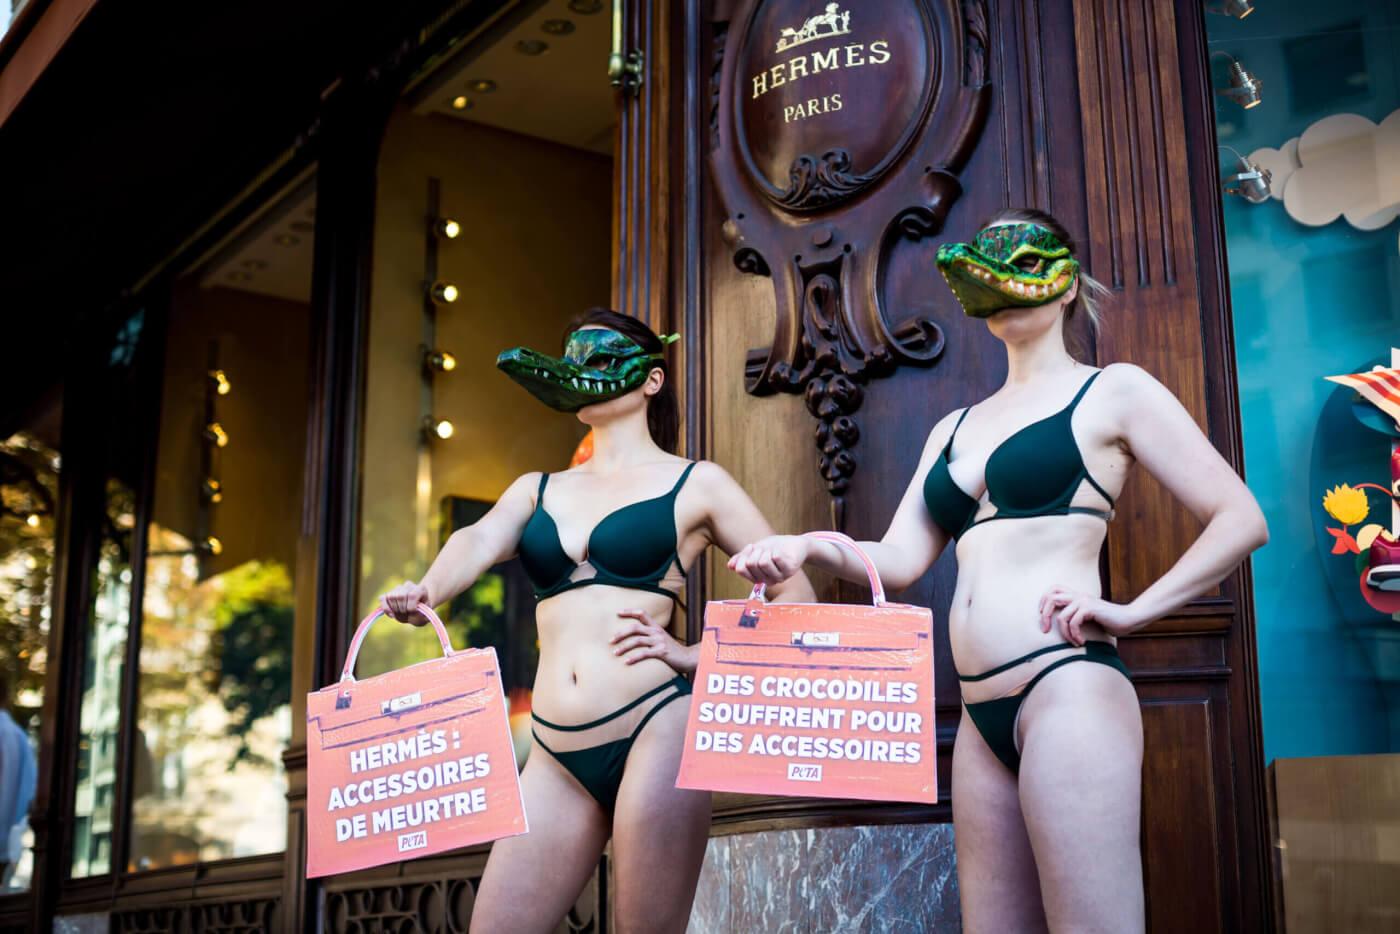 Activists wearing bikinis and crocodile masks protest at Hermès in Paris.